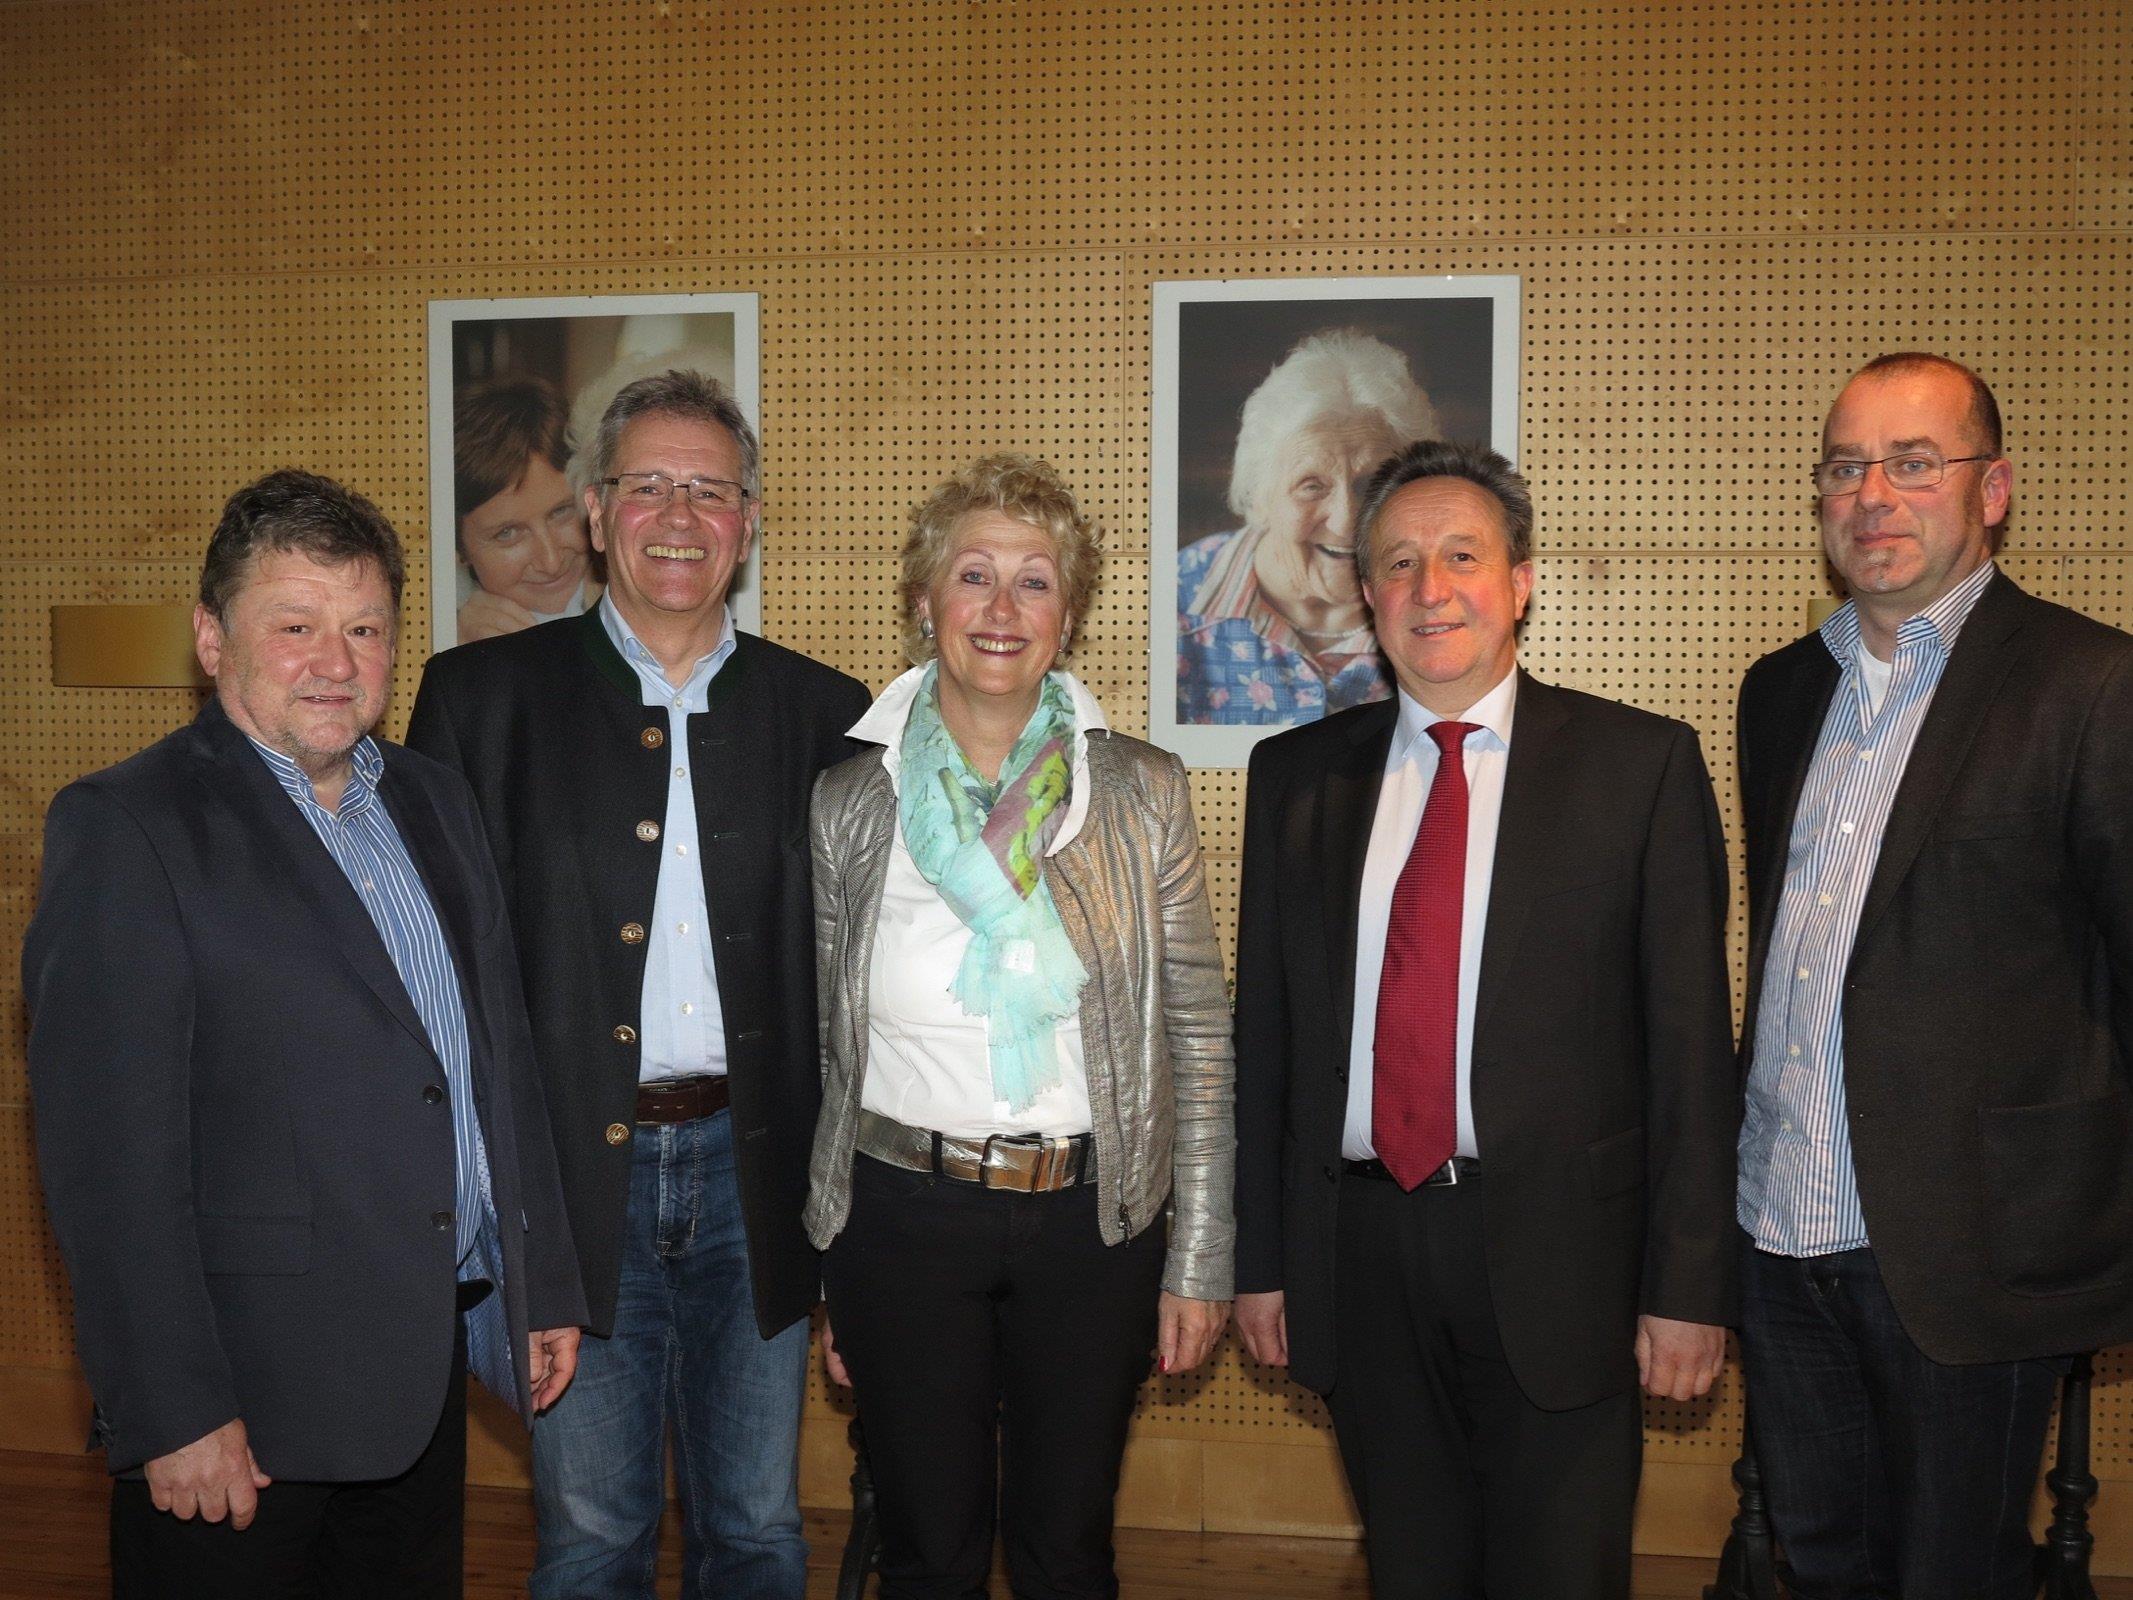 Kassier Josef Güfel, Obmann BR Edgar Mayer, Kitty Hertnagel, Landesobfrau der Arge MOHI, Sozialstadtrat Guntram Rederer und GF Wolfgang Breuss.